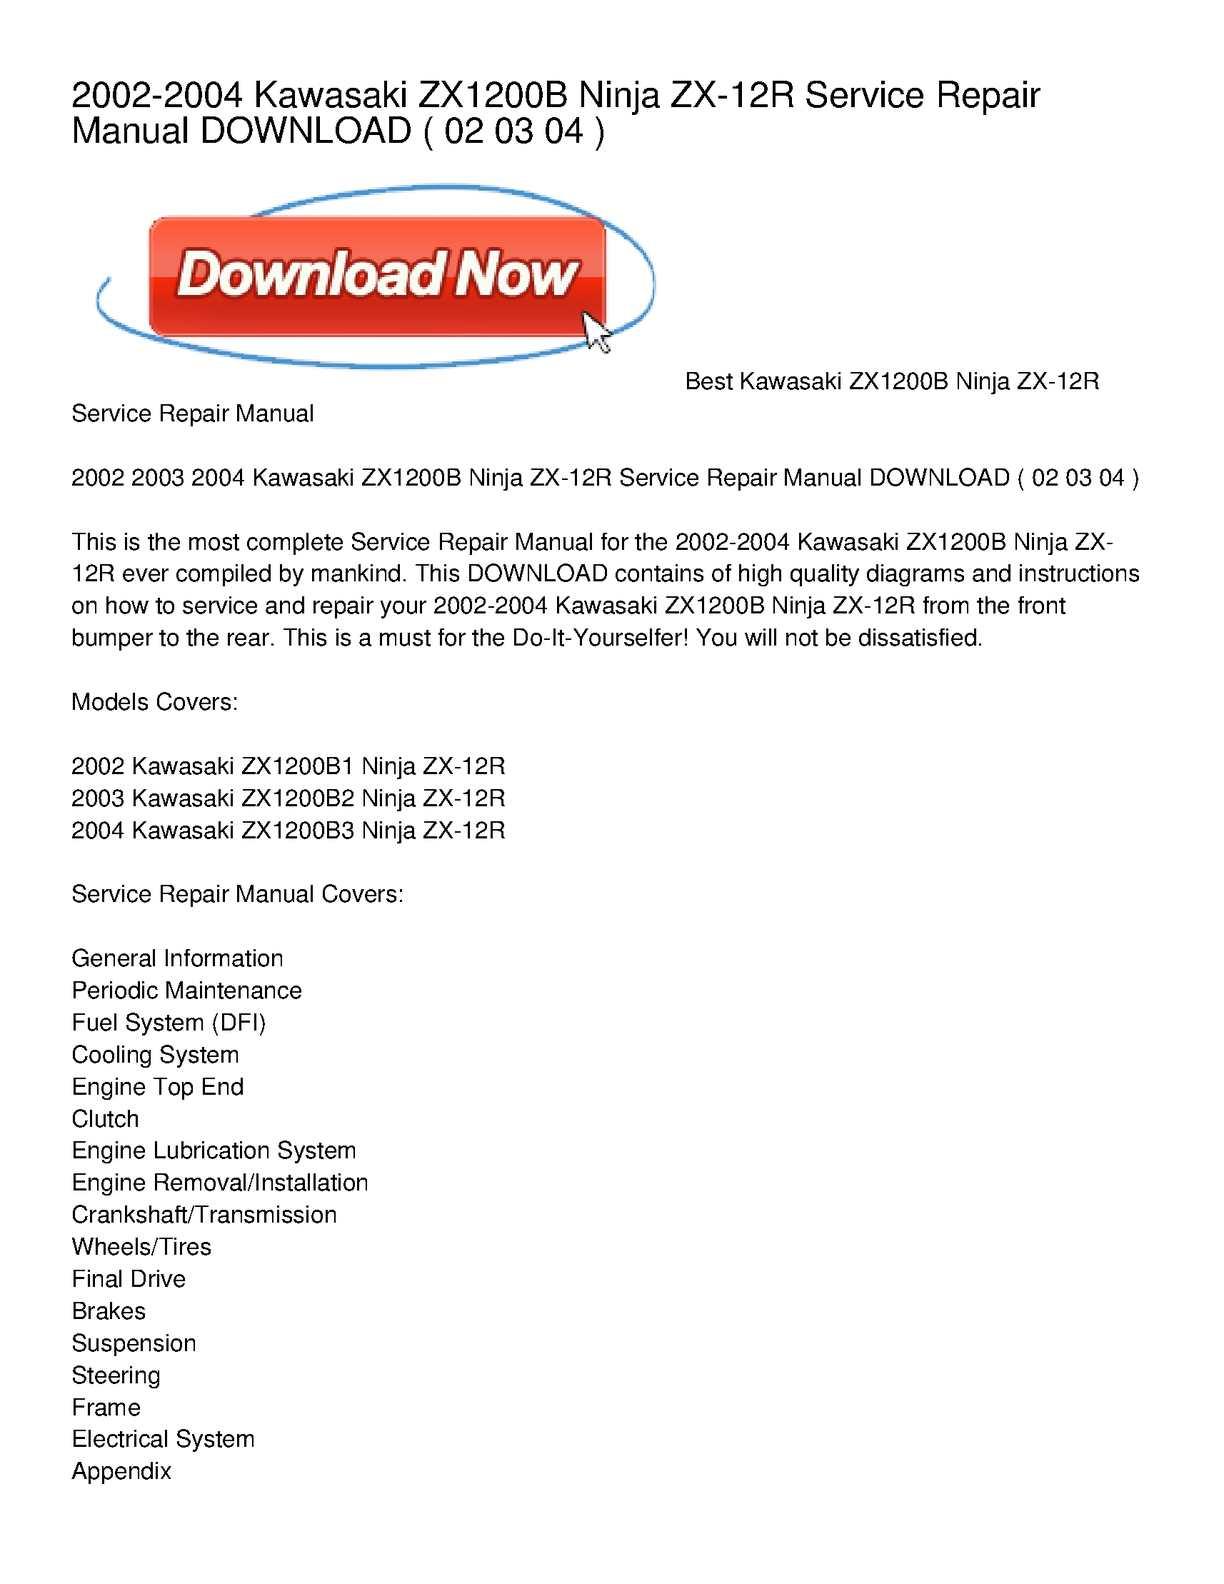 Calaméo - 2002-2004 Kawasaki ZX1200B Ninja ZX-12R Service Repair Manual  DOWNLOAD